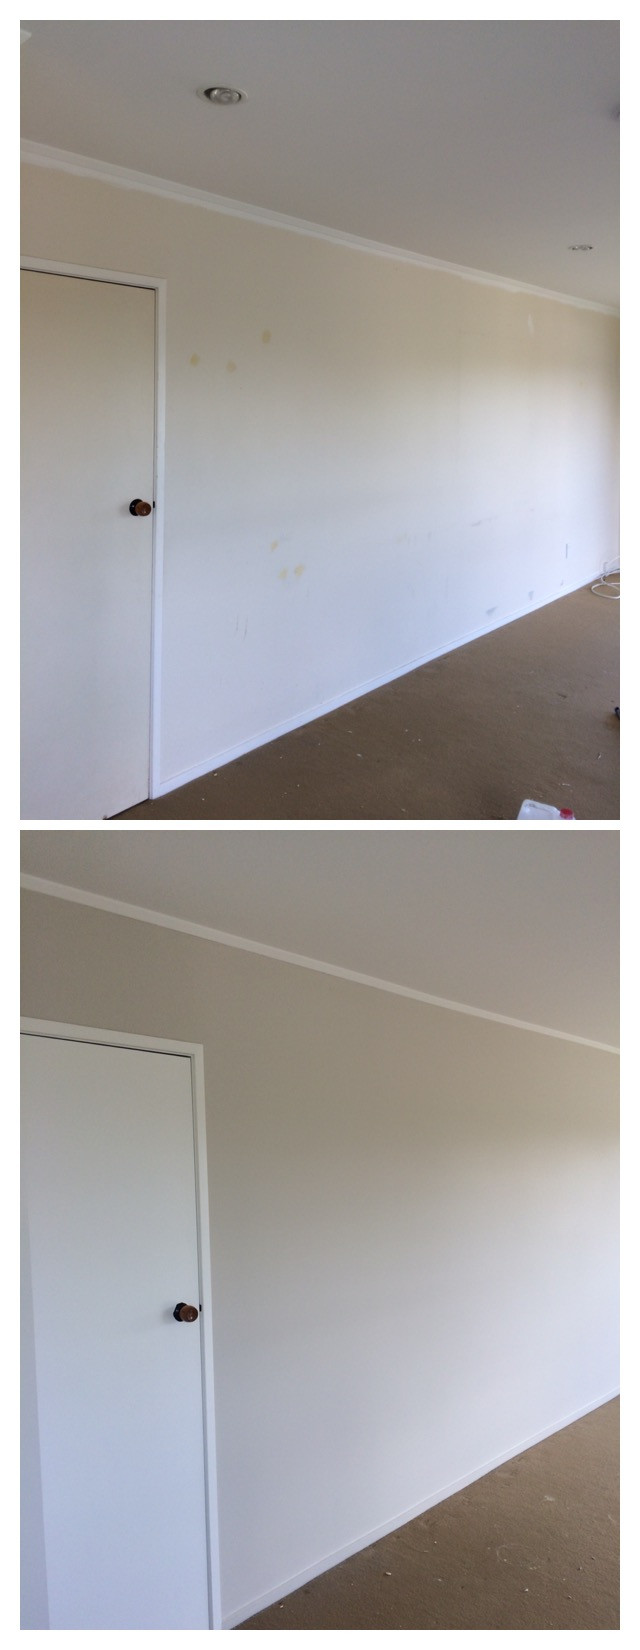 InteriorHouse Painting Birkenhead,North Shore,Auckland